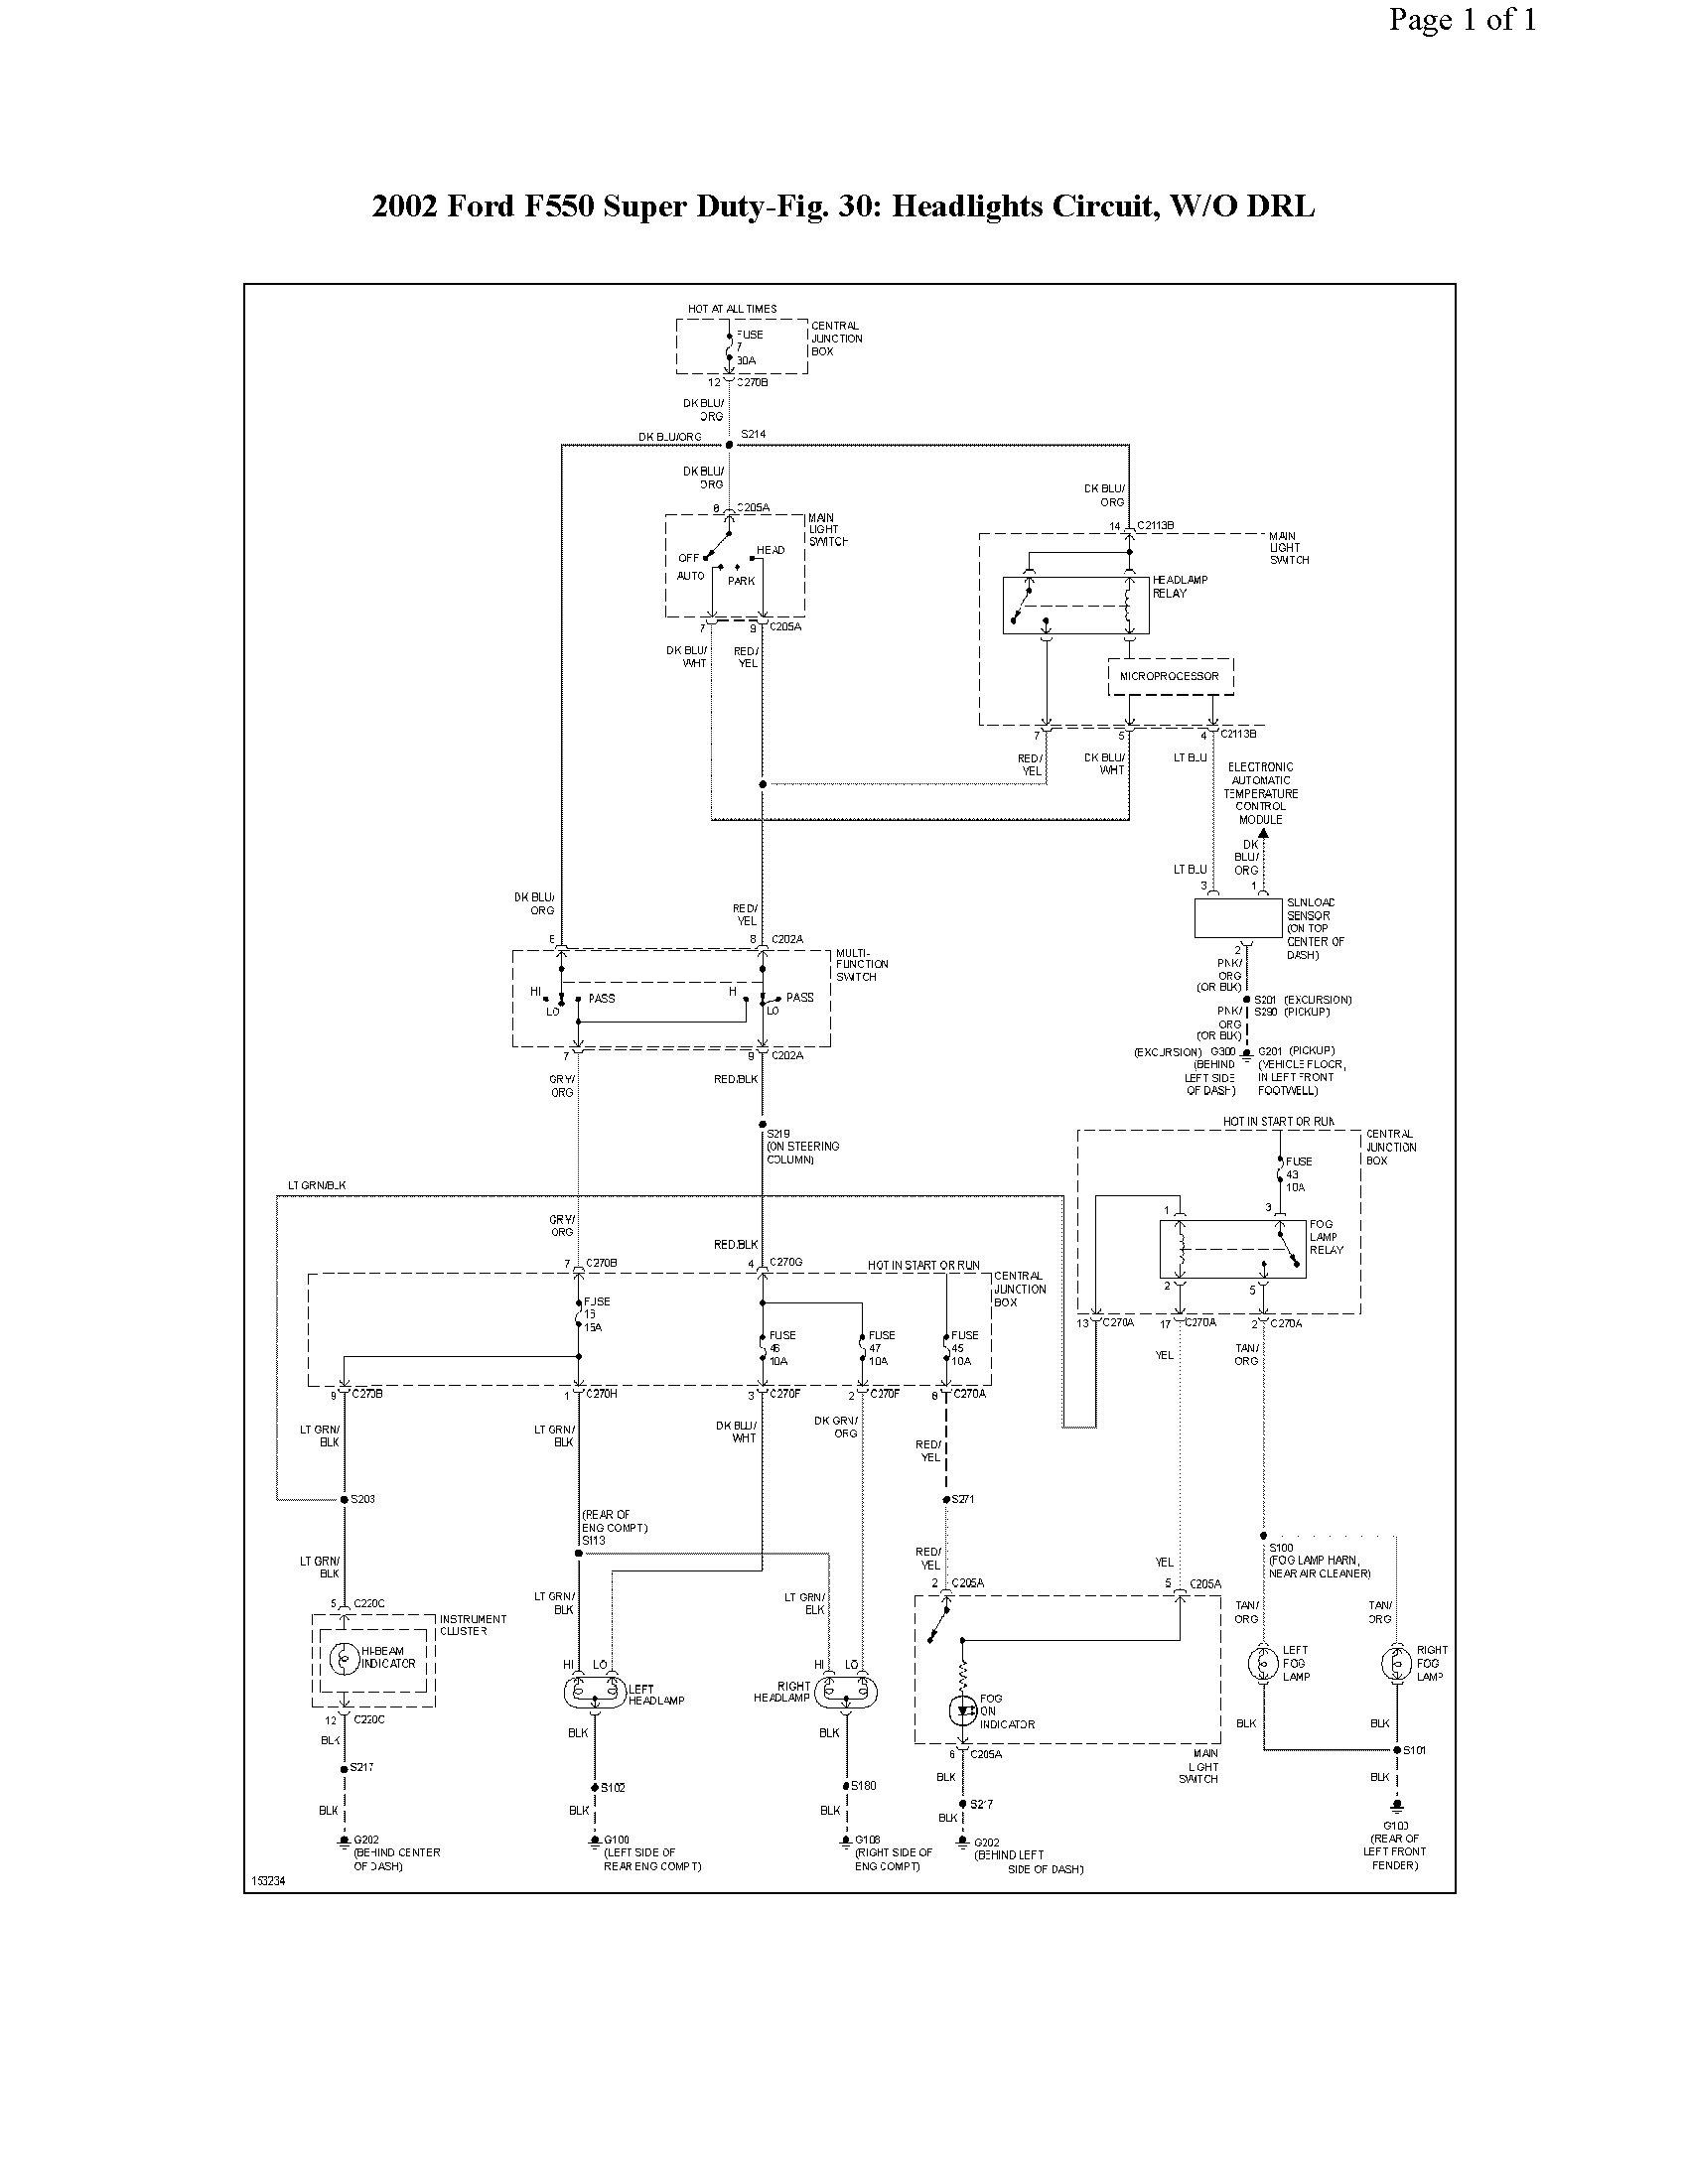 2002 ford f550 fuse box 2014 ford f550 fuse box i am working on a 02 f550 super duty 7.3l 4wd fuse 44 kept ...